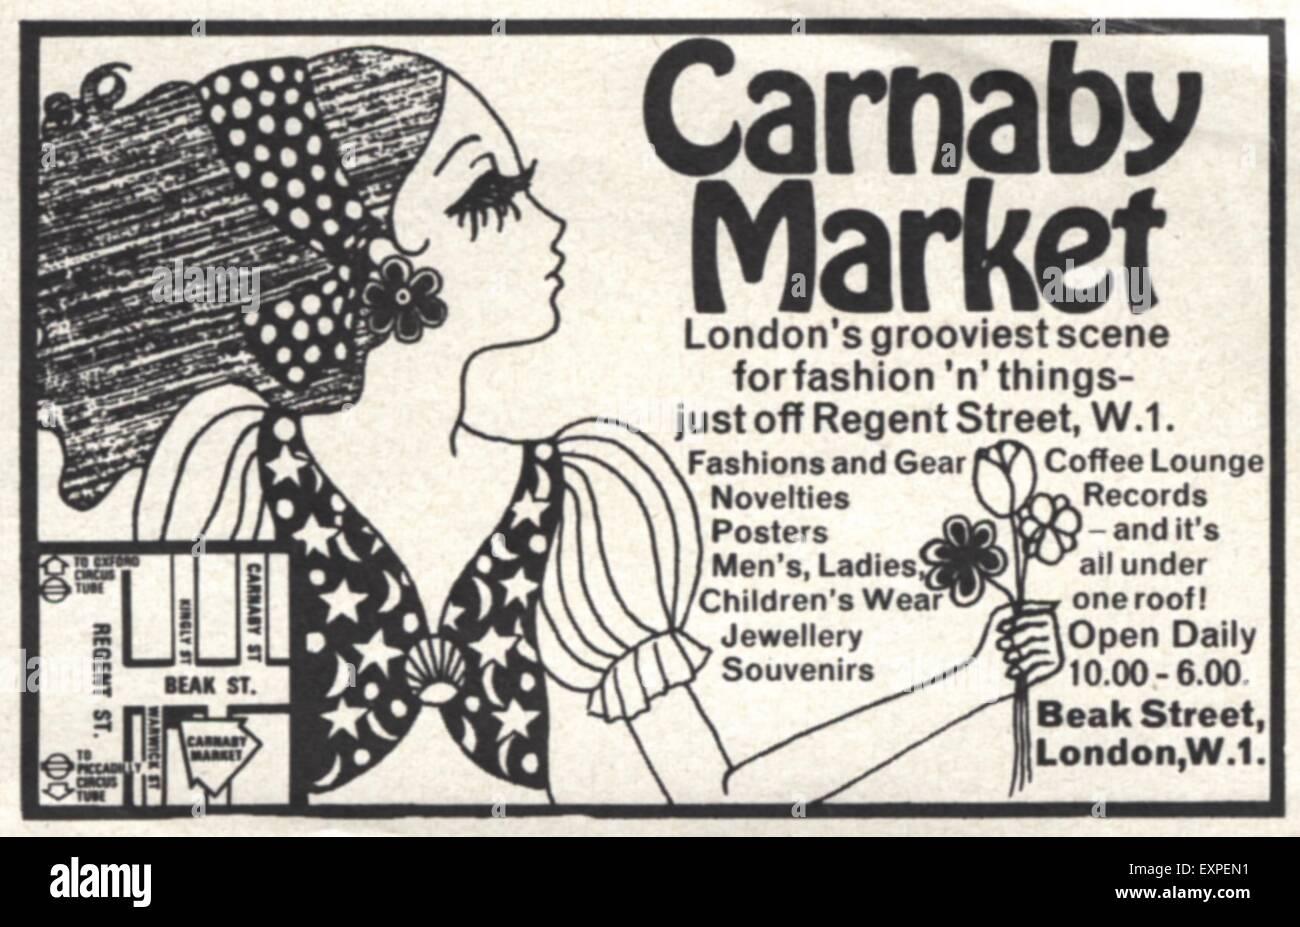 1960s UK Carnaby Market Magazine Advert - Stock Image